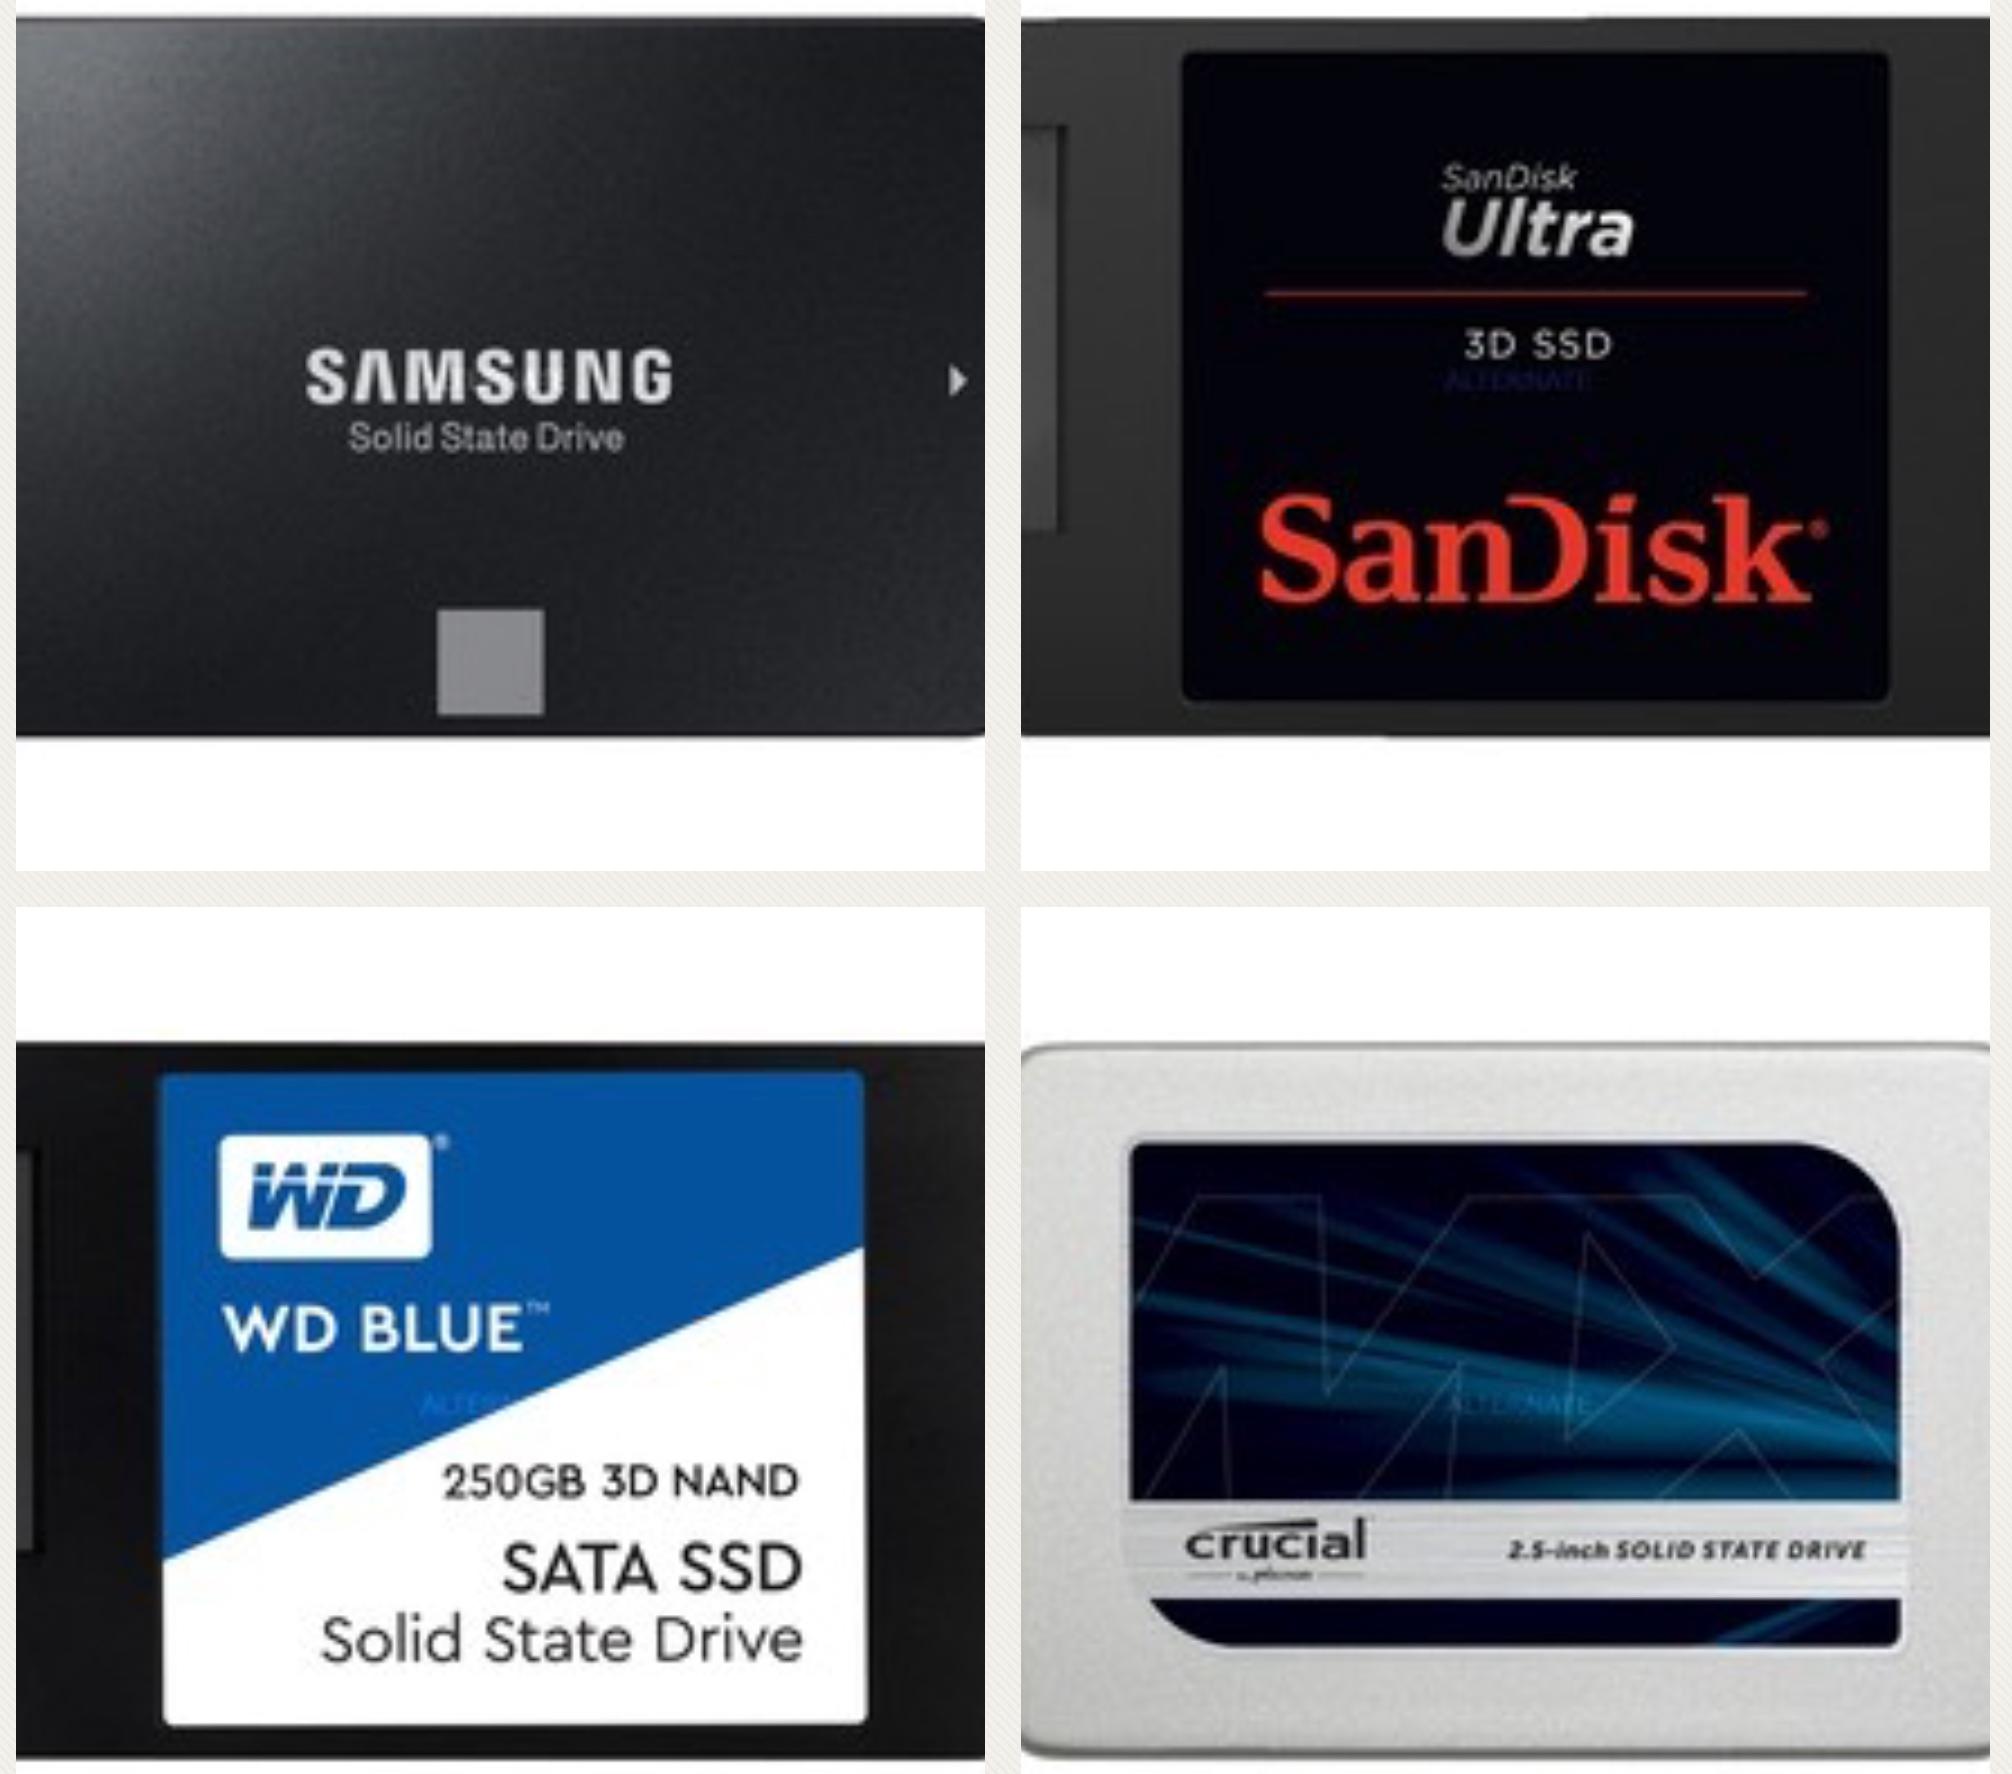 [Alternate] SSDs z.B. Samsung 860 EVO 250GB o. Crucial MX300 275 GB o. SanDisk Ultra 3D 250 GB für je 60,89€ mit Paydirekt Gutschein